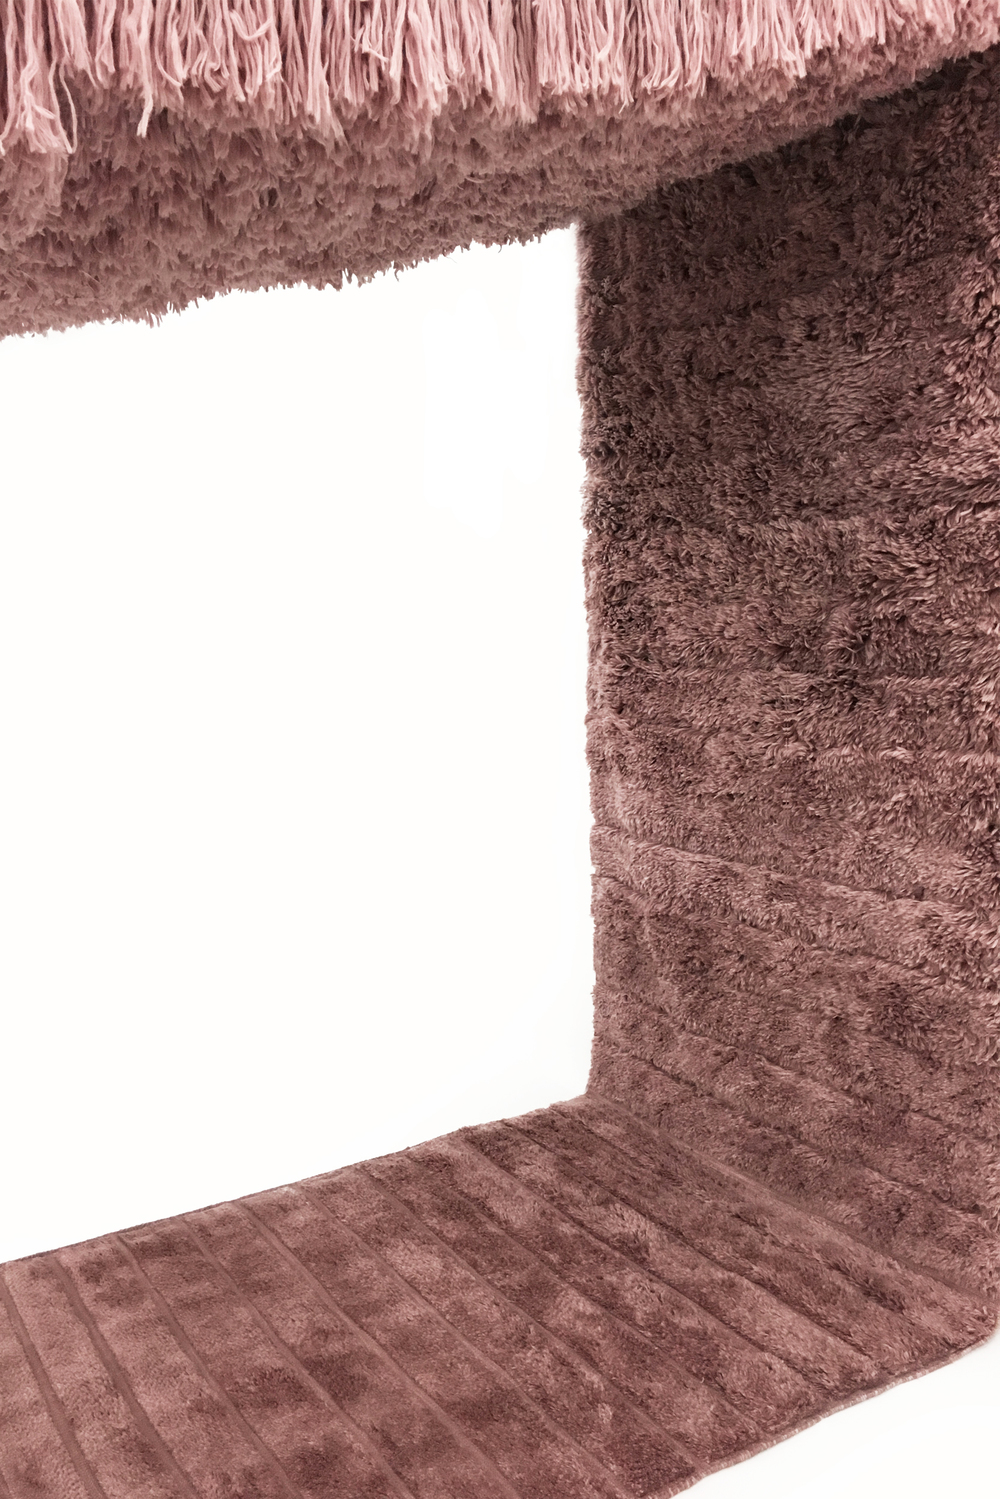 nirvana_rug_detail-01.jpg